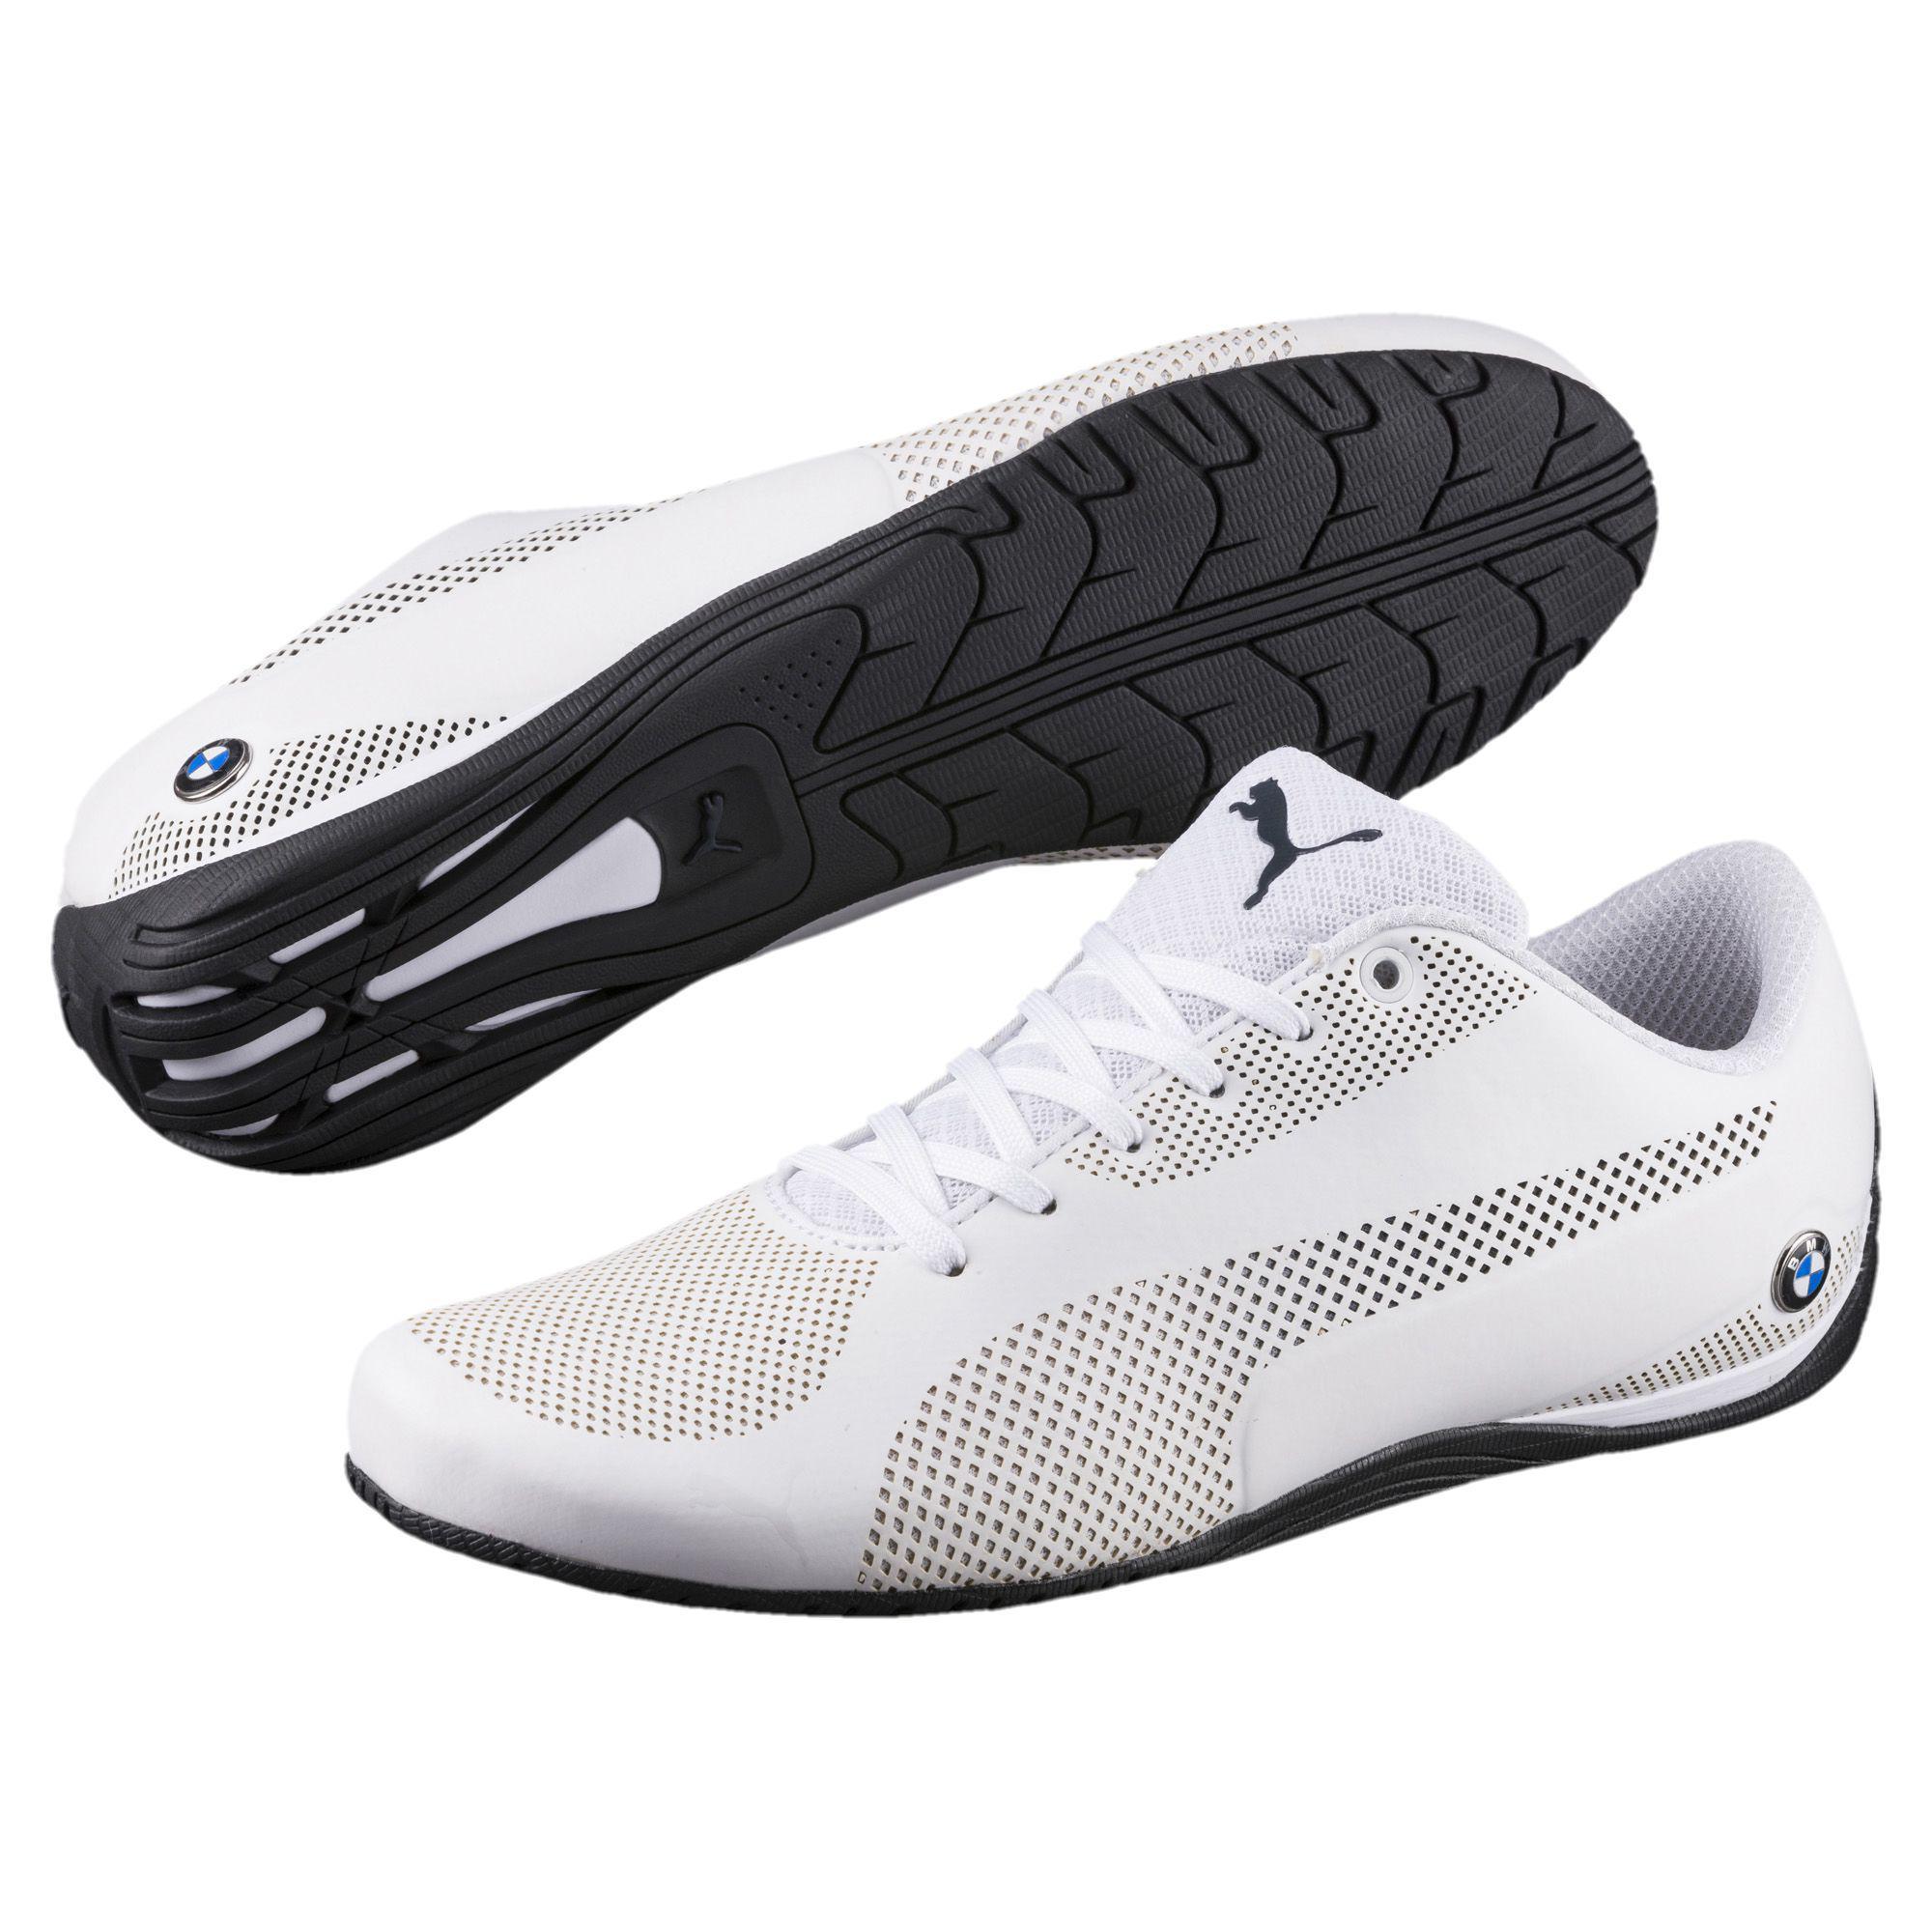 e16063c410db78 PUMA - White Bmw Motorsport Drift Cat 5 Ultra Training Shoes for Men -  Lyst. View fullscreen